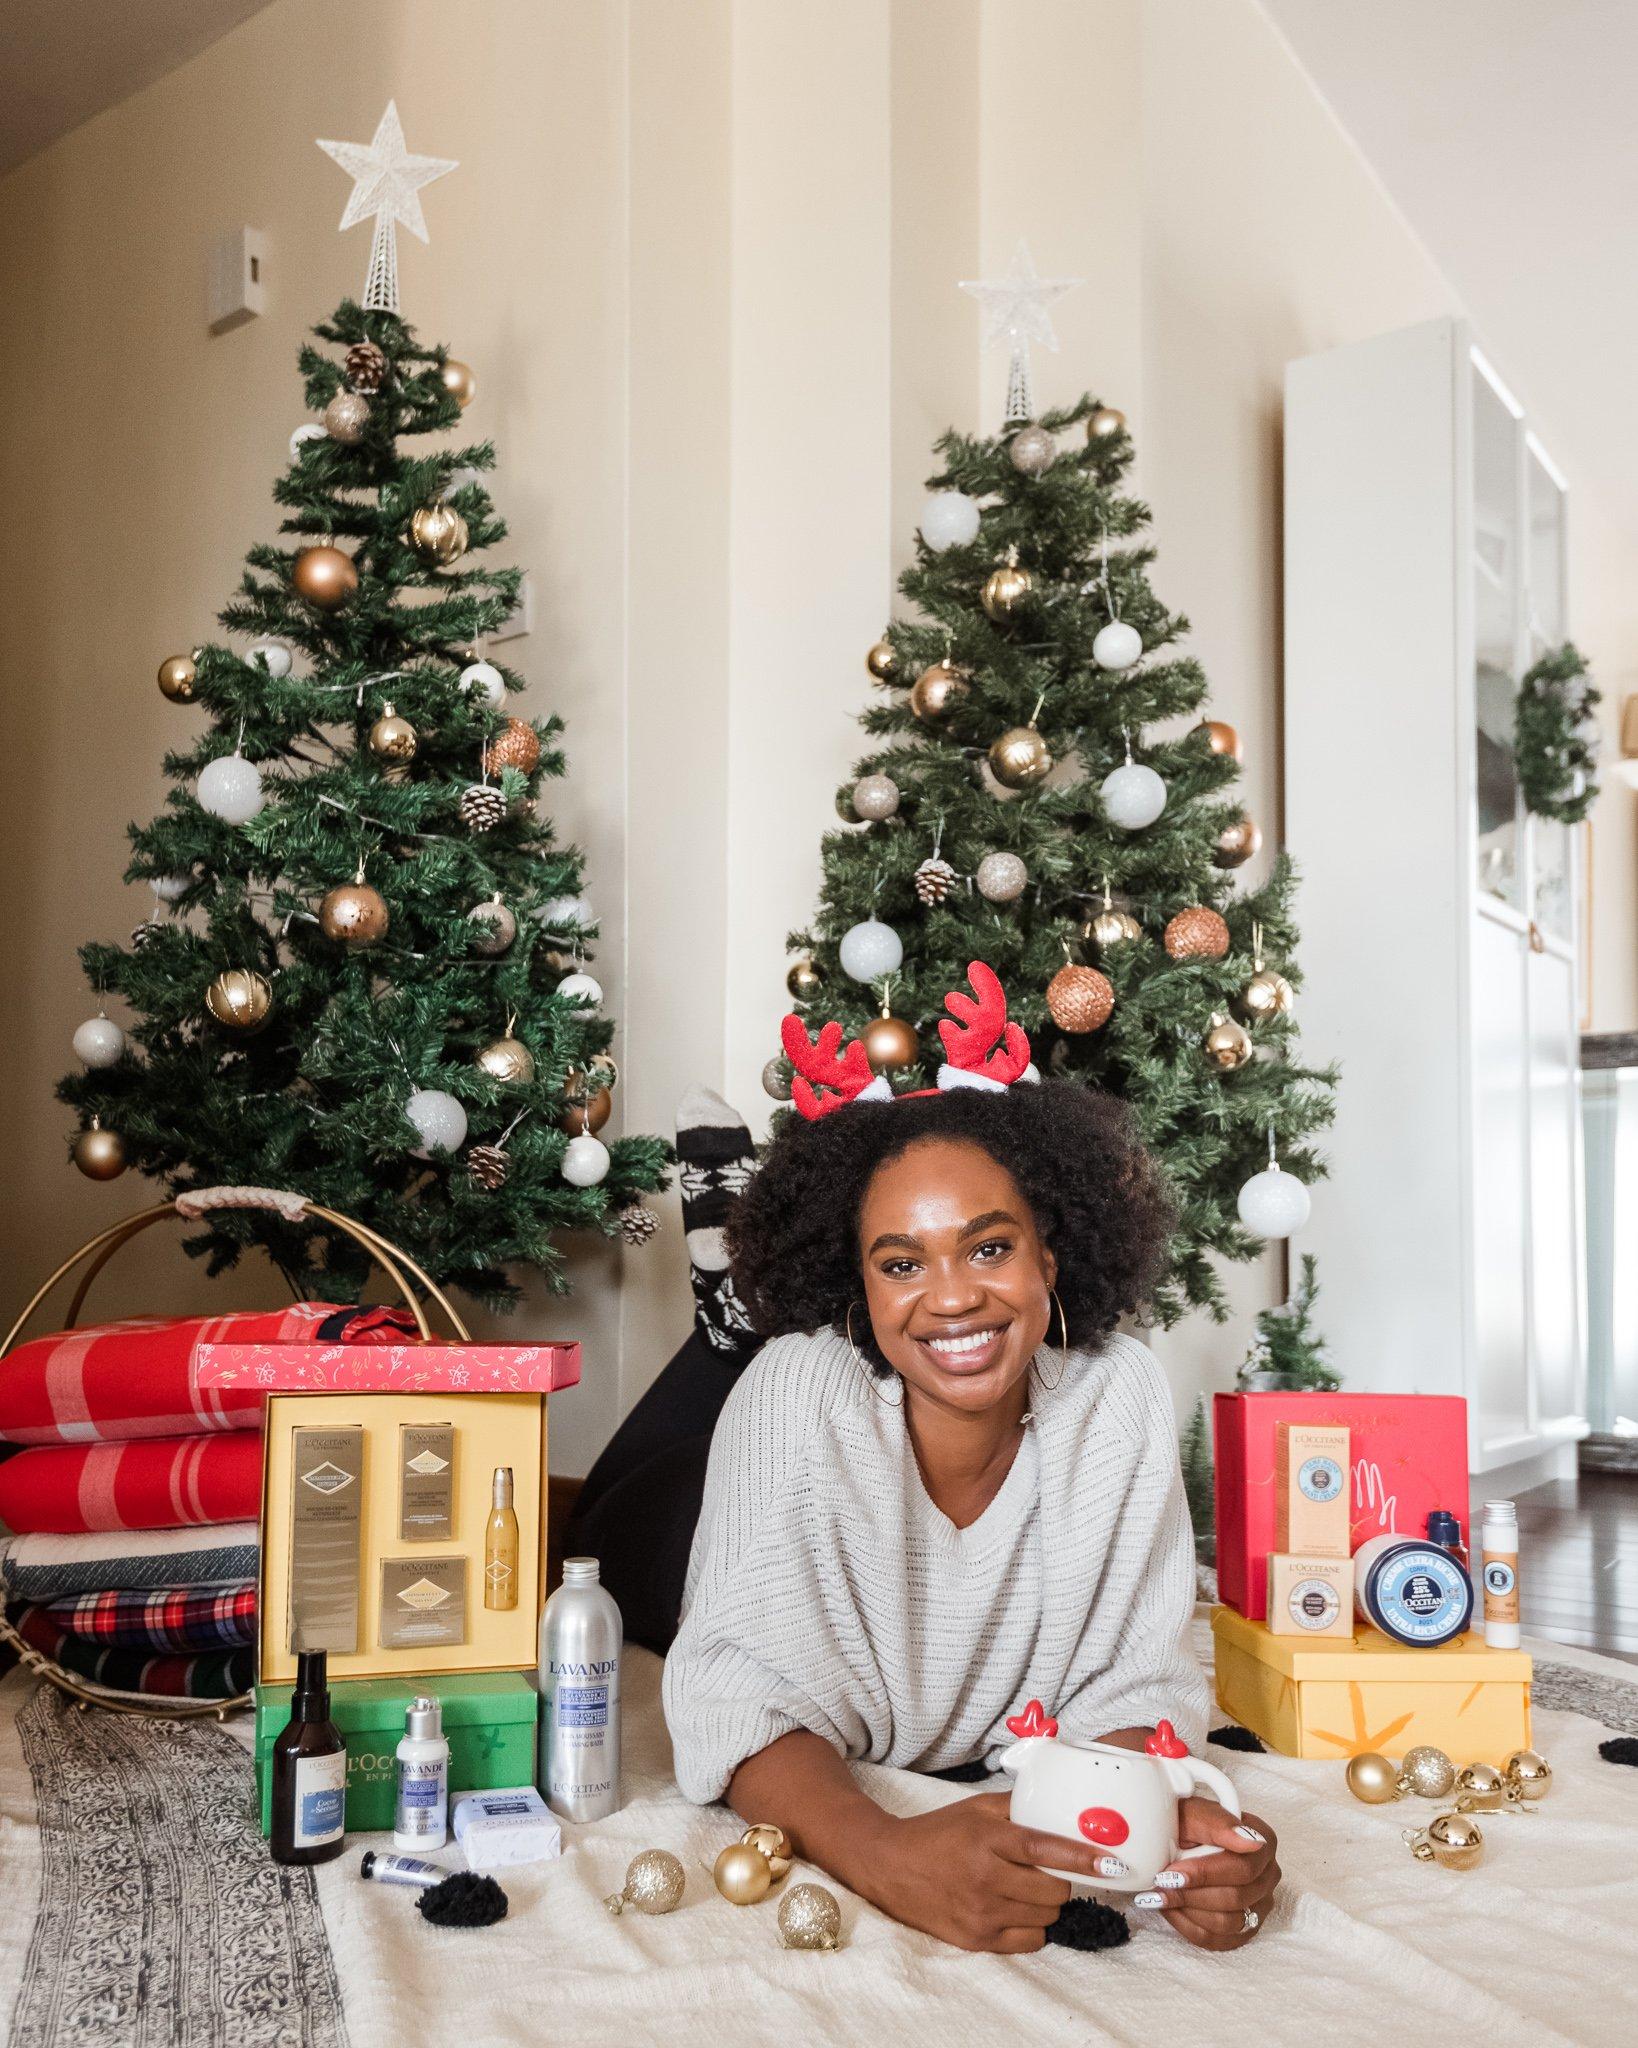 L'Occitane Holiday Gifts x Ijeoma Kola 8